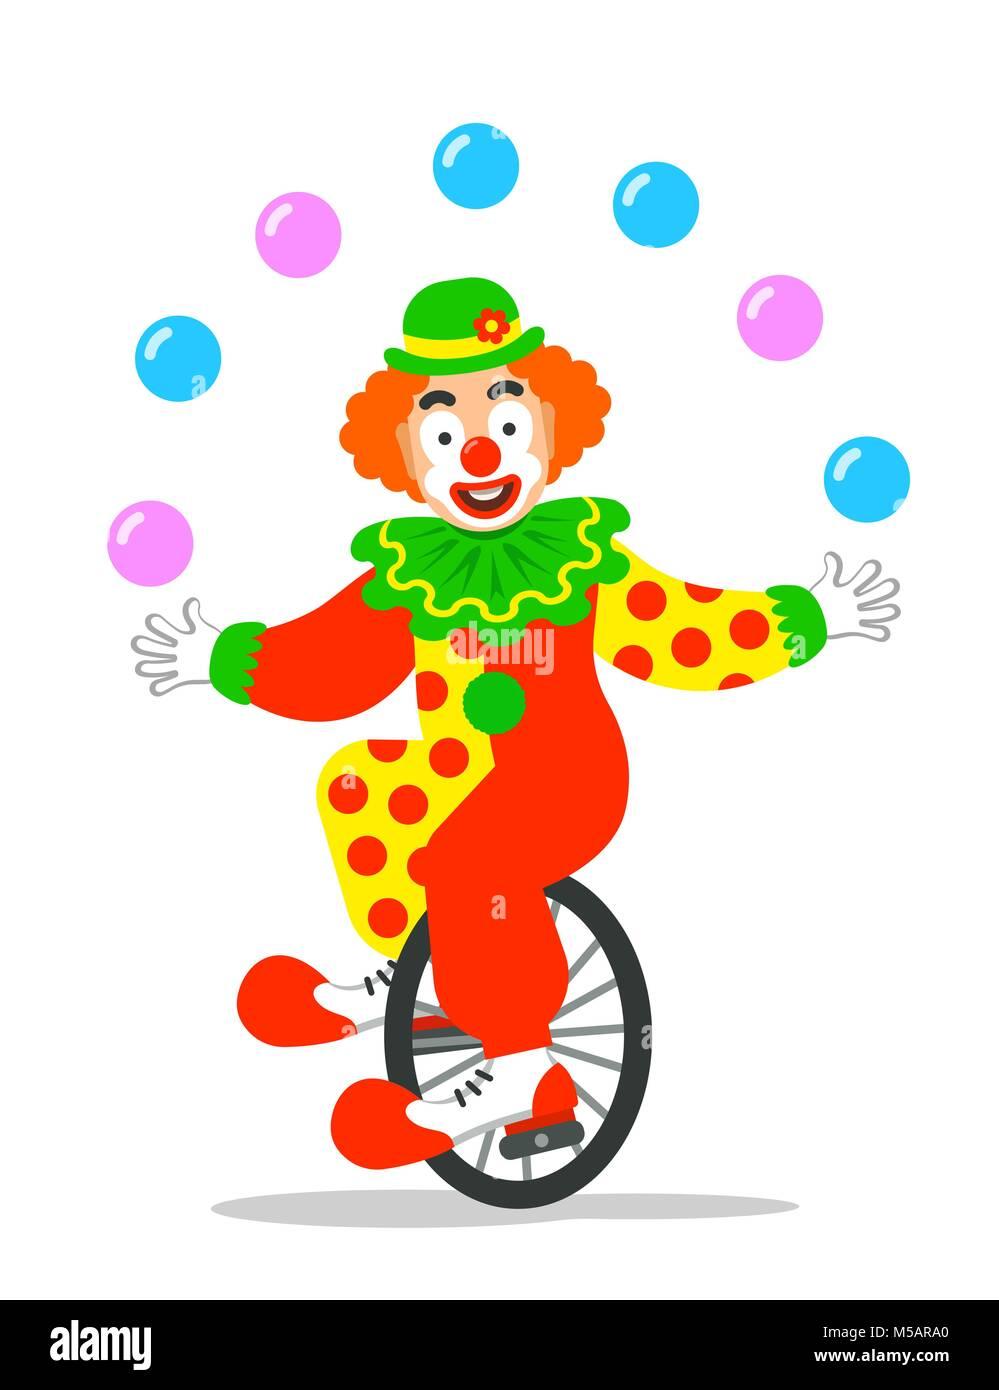 Funny Clown De Cirque Balles De Jonglage Sur Monocycle Cartoon